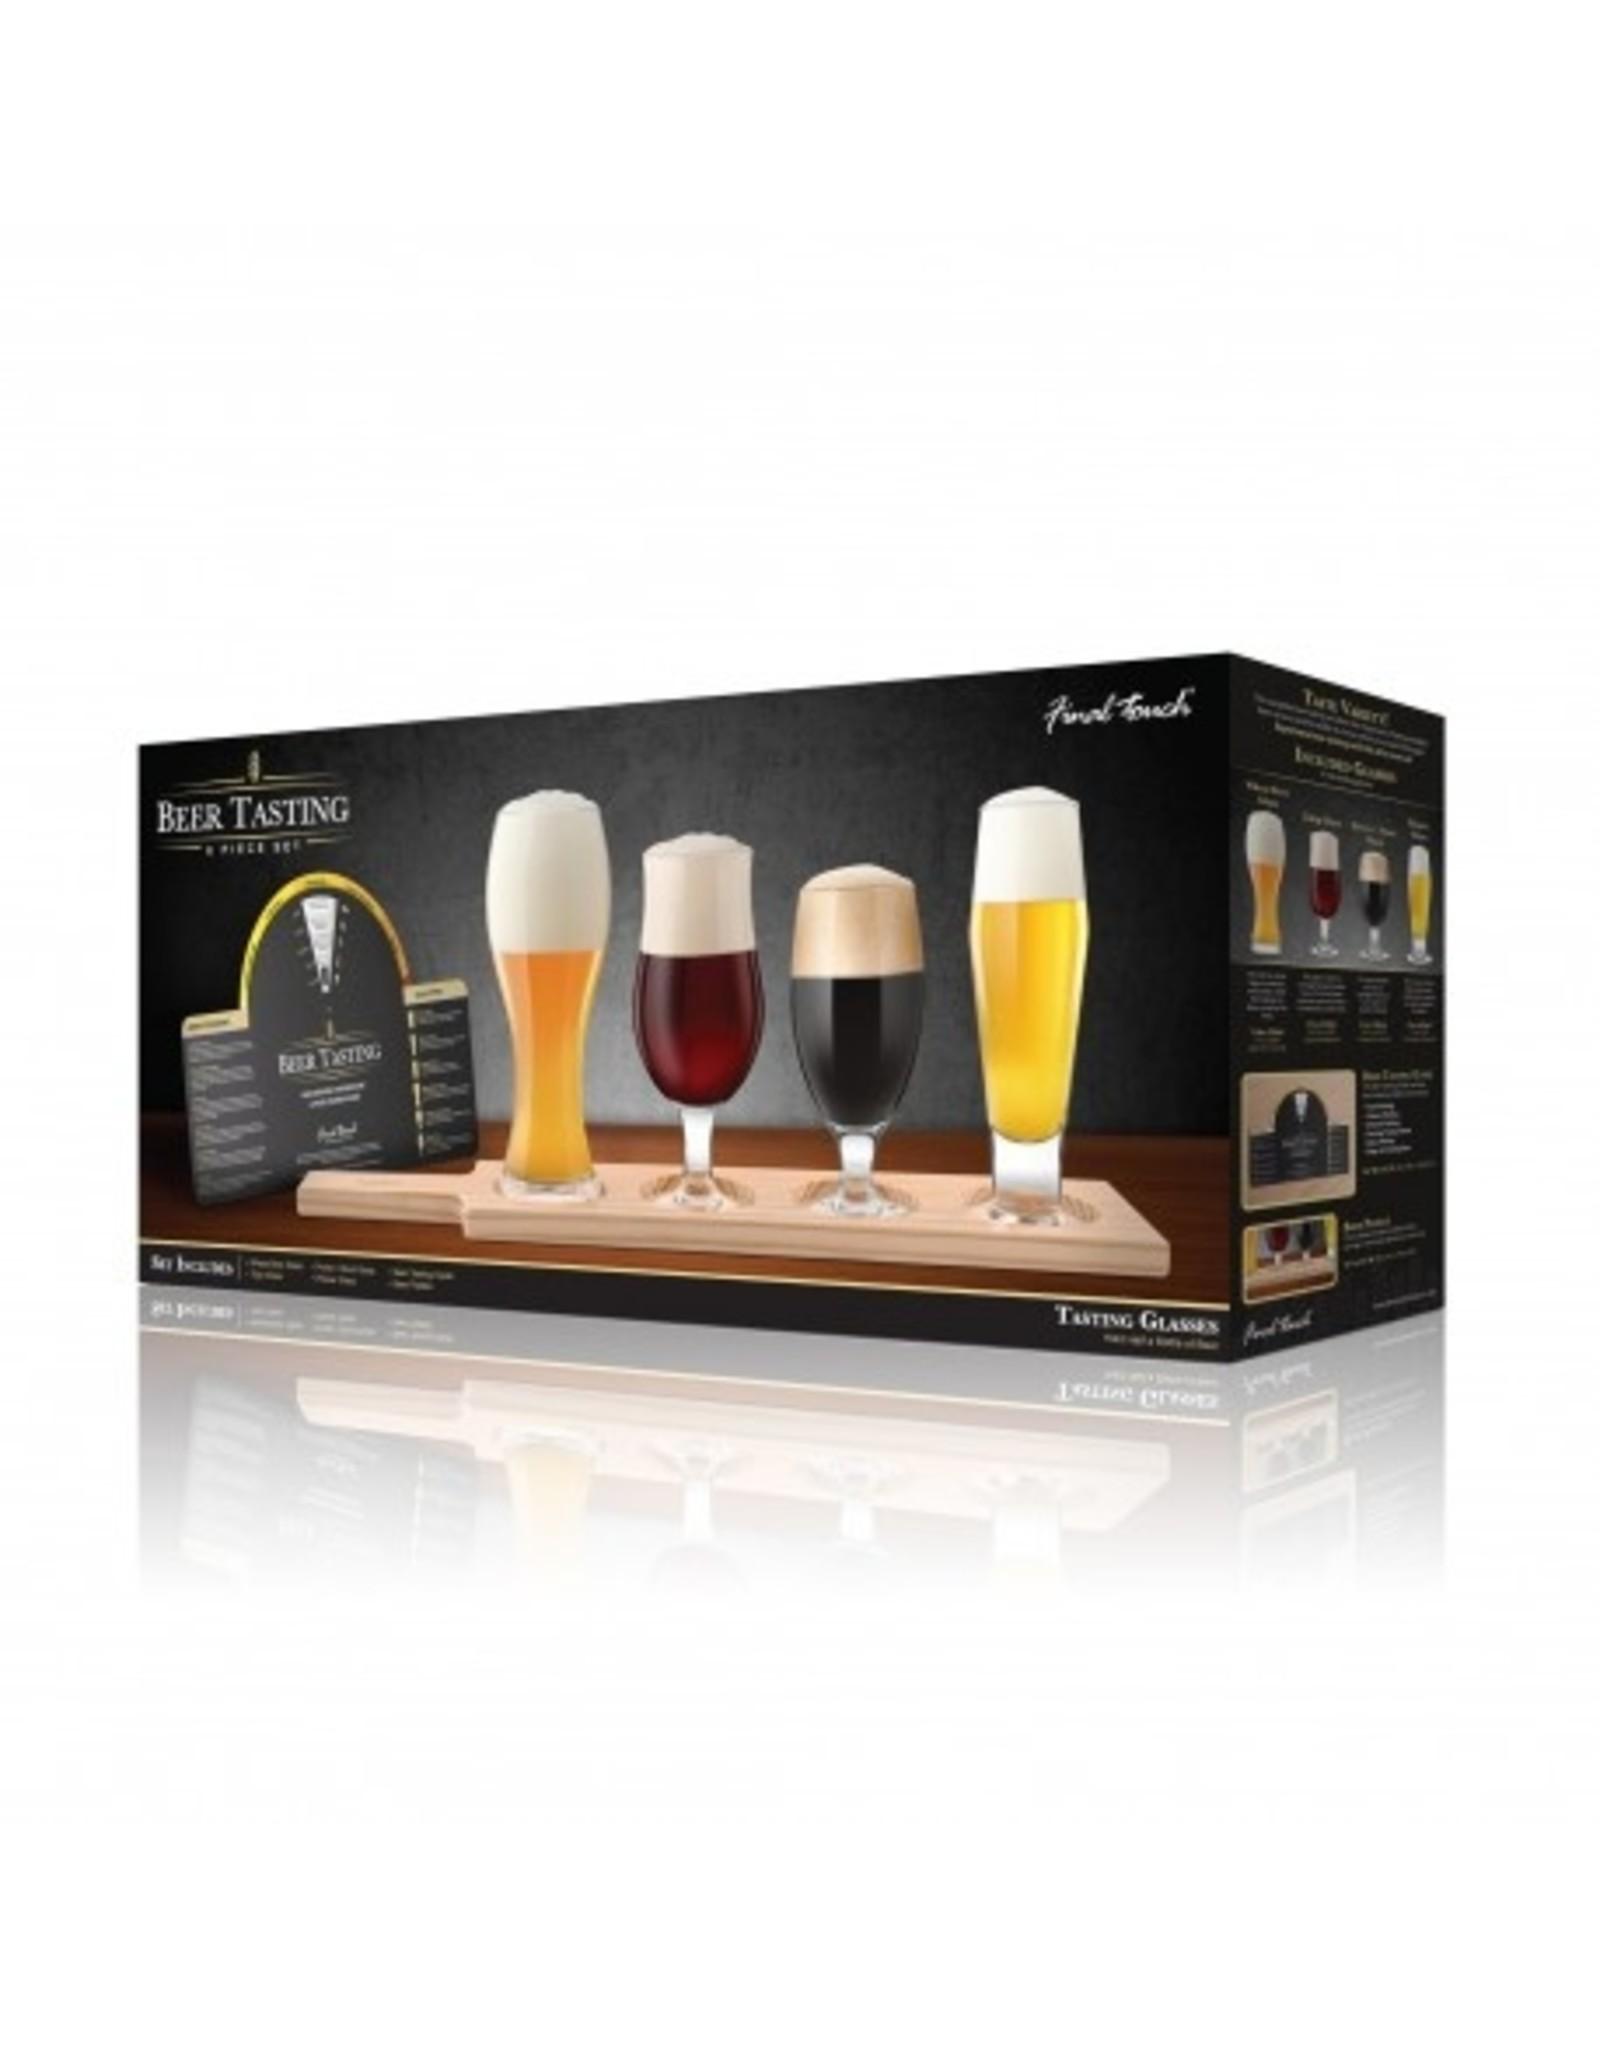 Beer Tasting Set - 4 Glass + Wood Paddle 6pc set